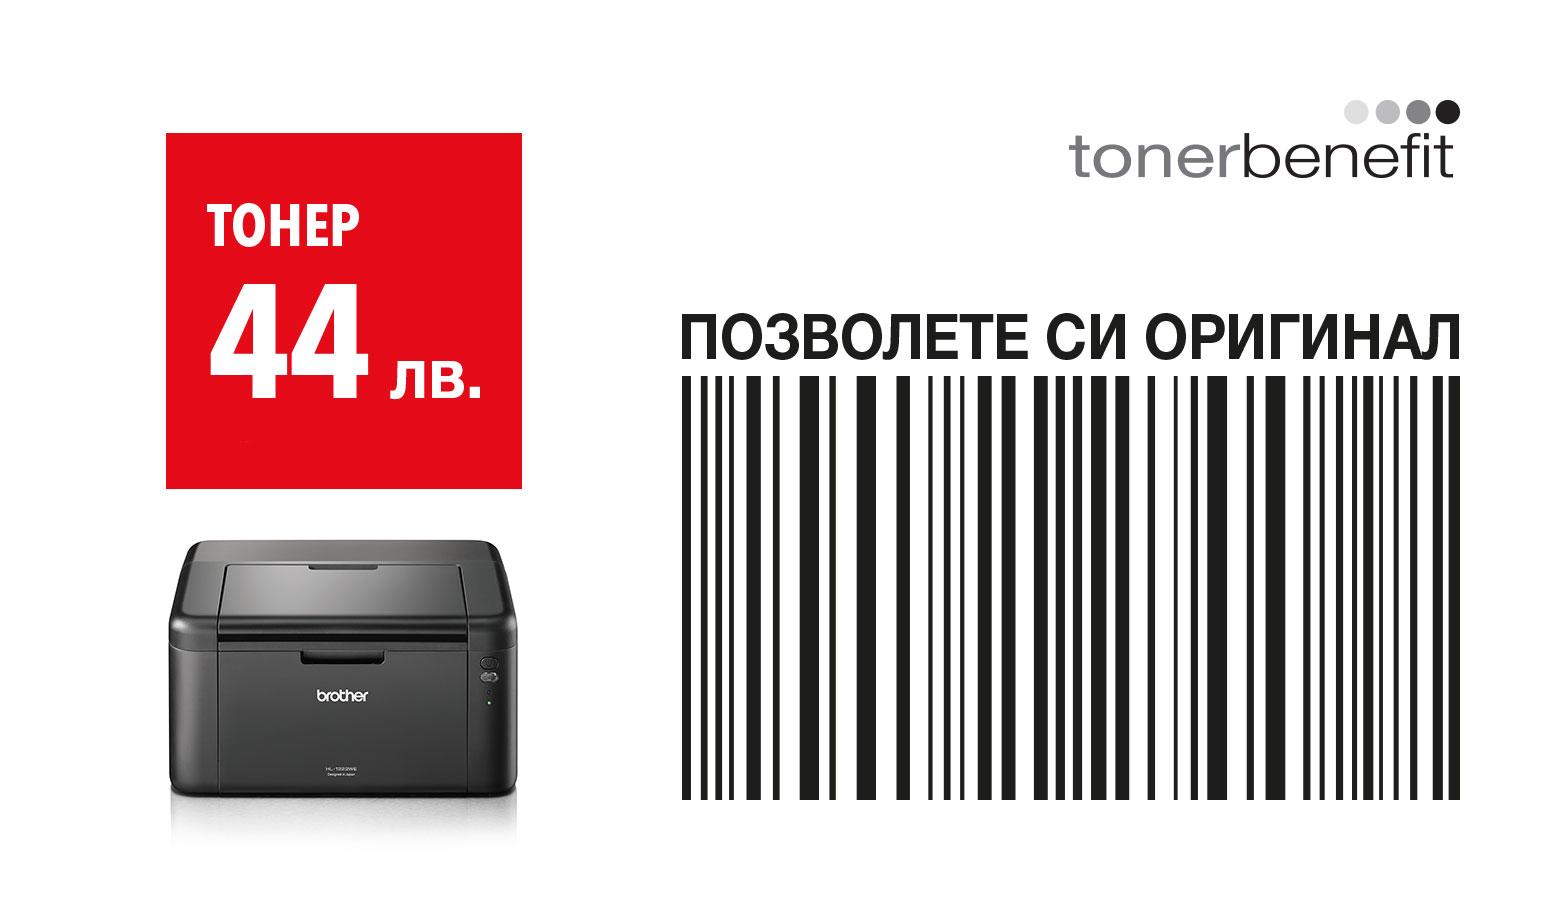 TonerBenefit_hero_1560x900px_BG